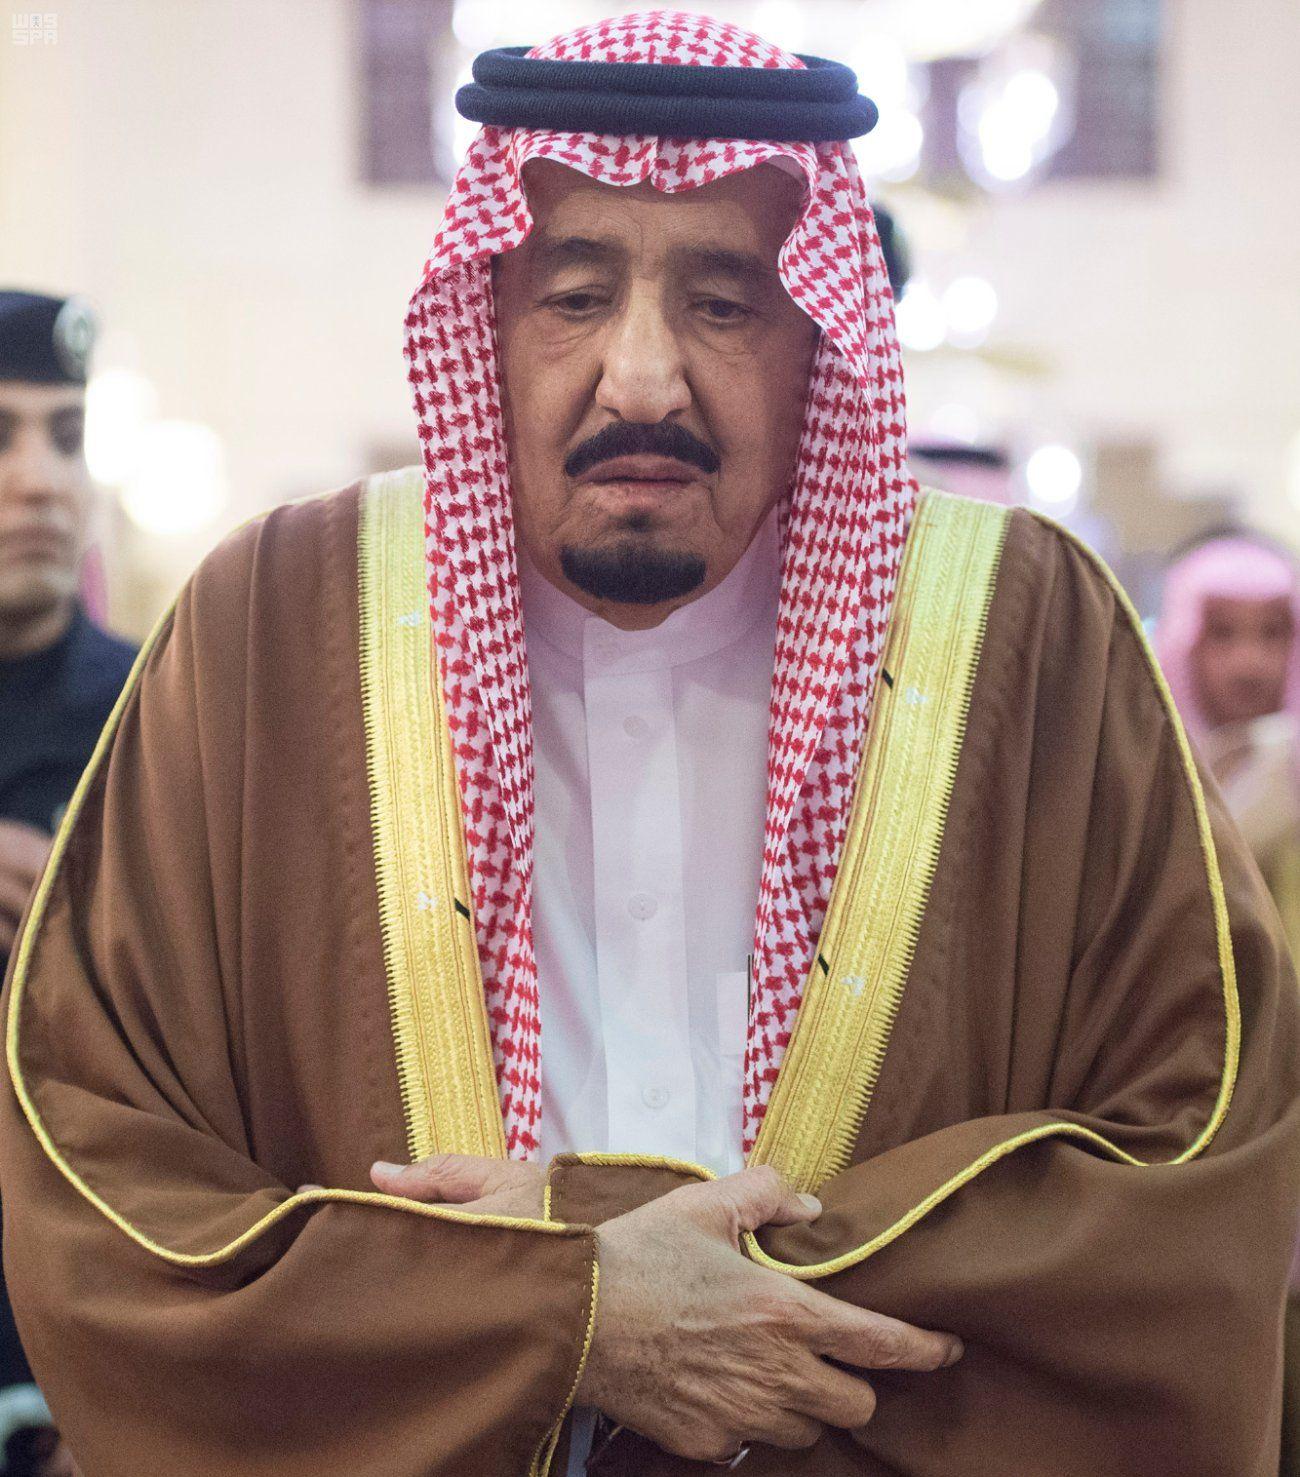 Prince Turki Bin Abdulziz A Brother Of Saudi Arabia S King Has Died Aged 83 In Riyadh On King Brother British Royals